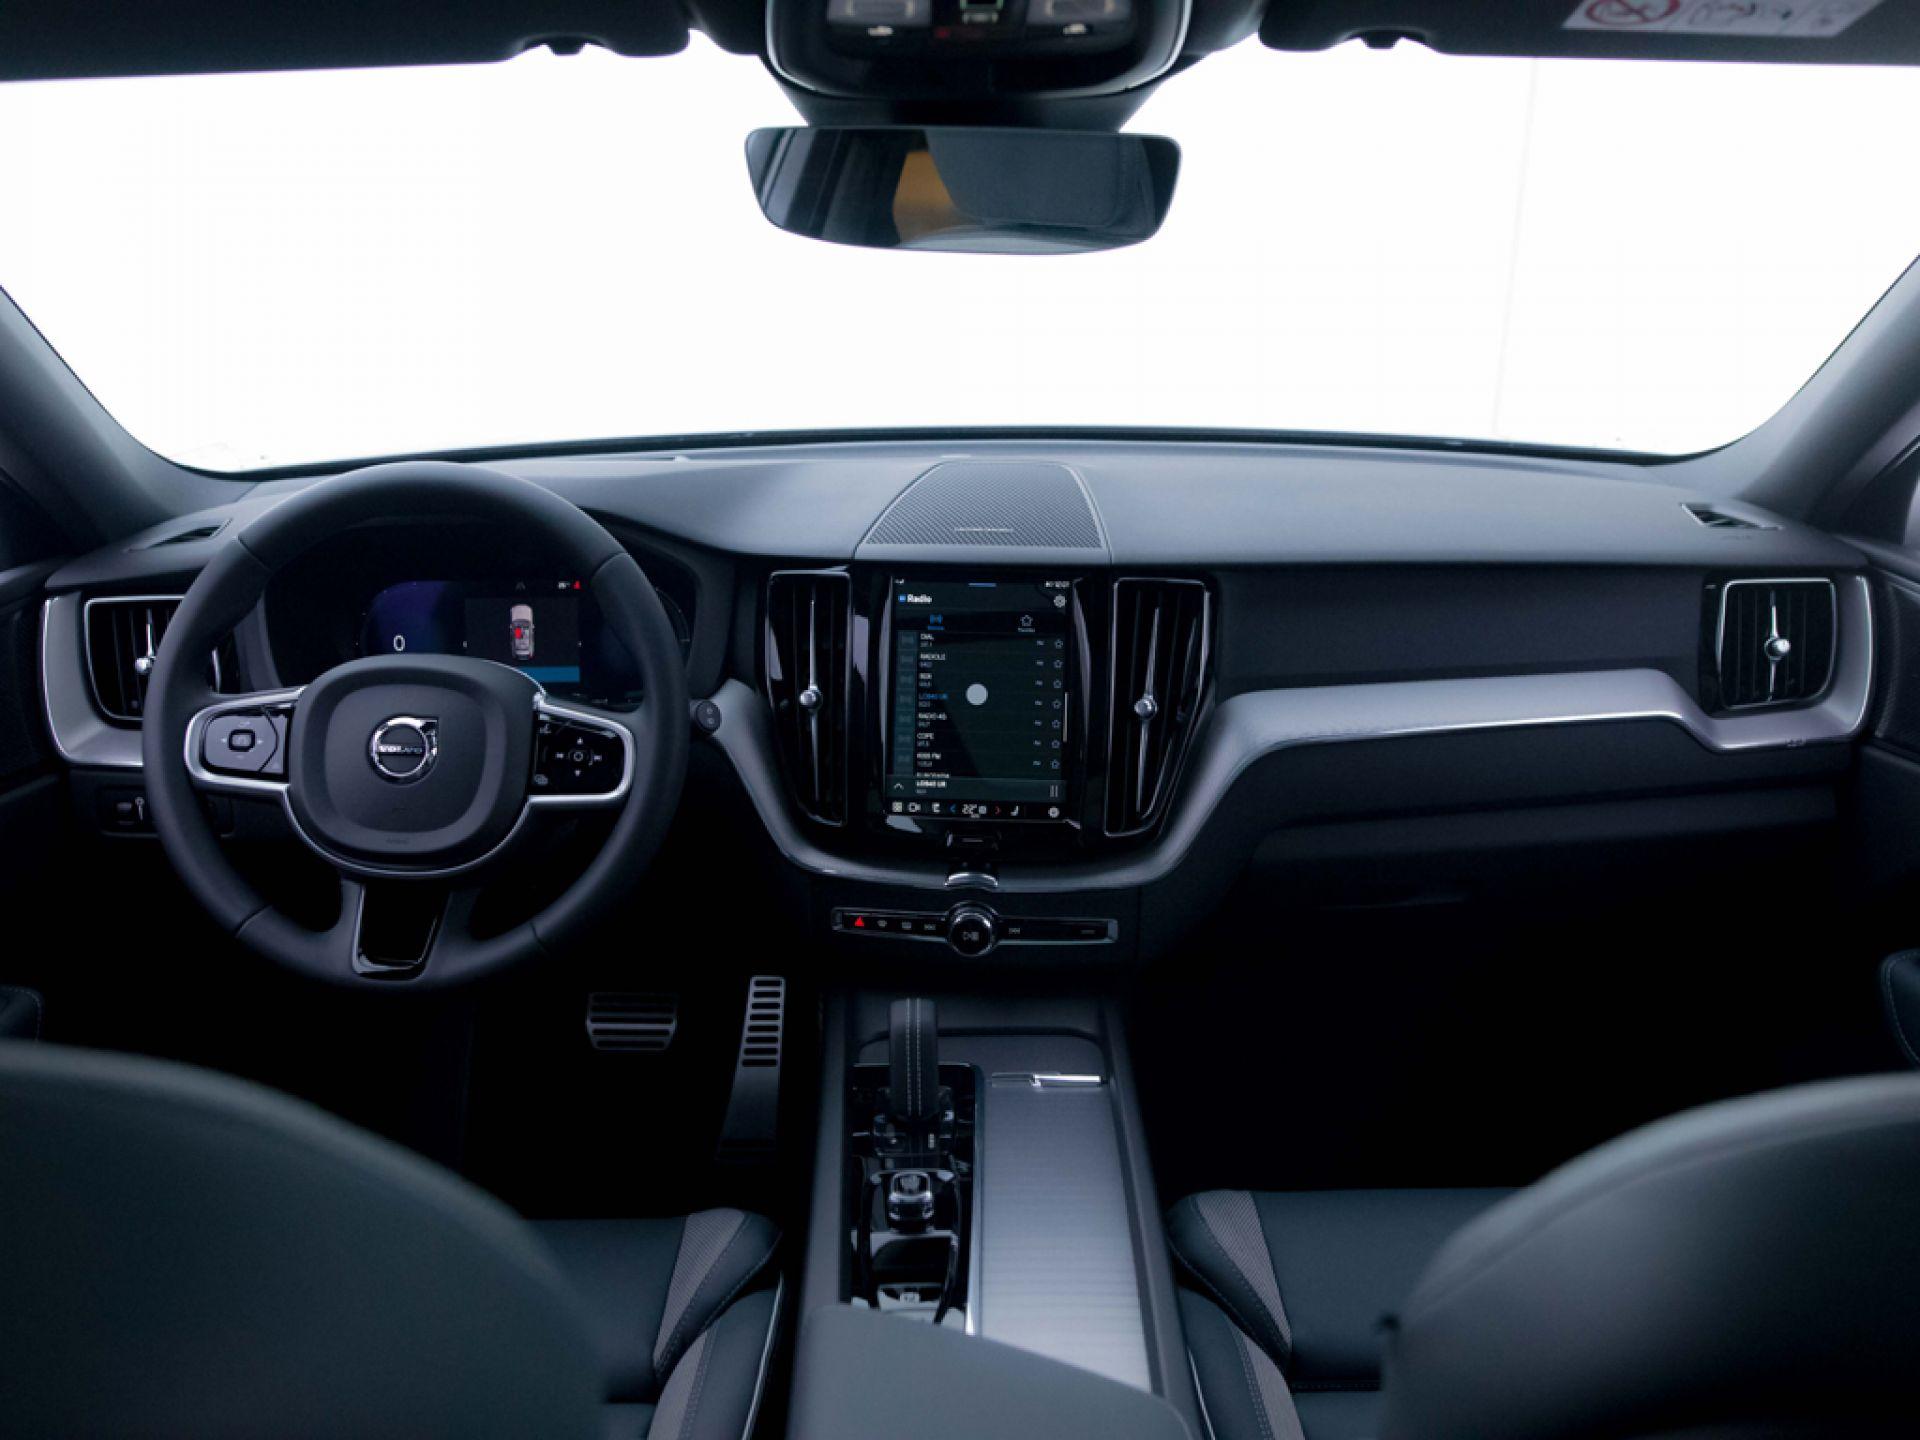 Volvo XC60 2.0 T6 AWD Recharge R-Design Auto